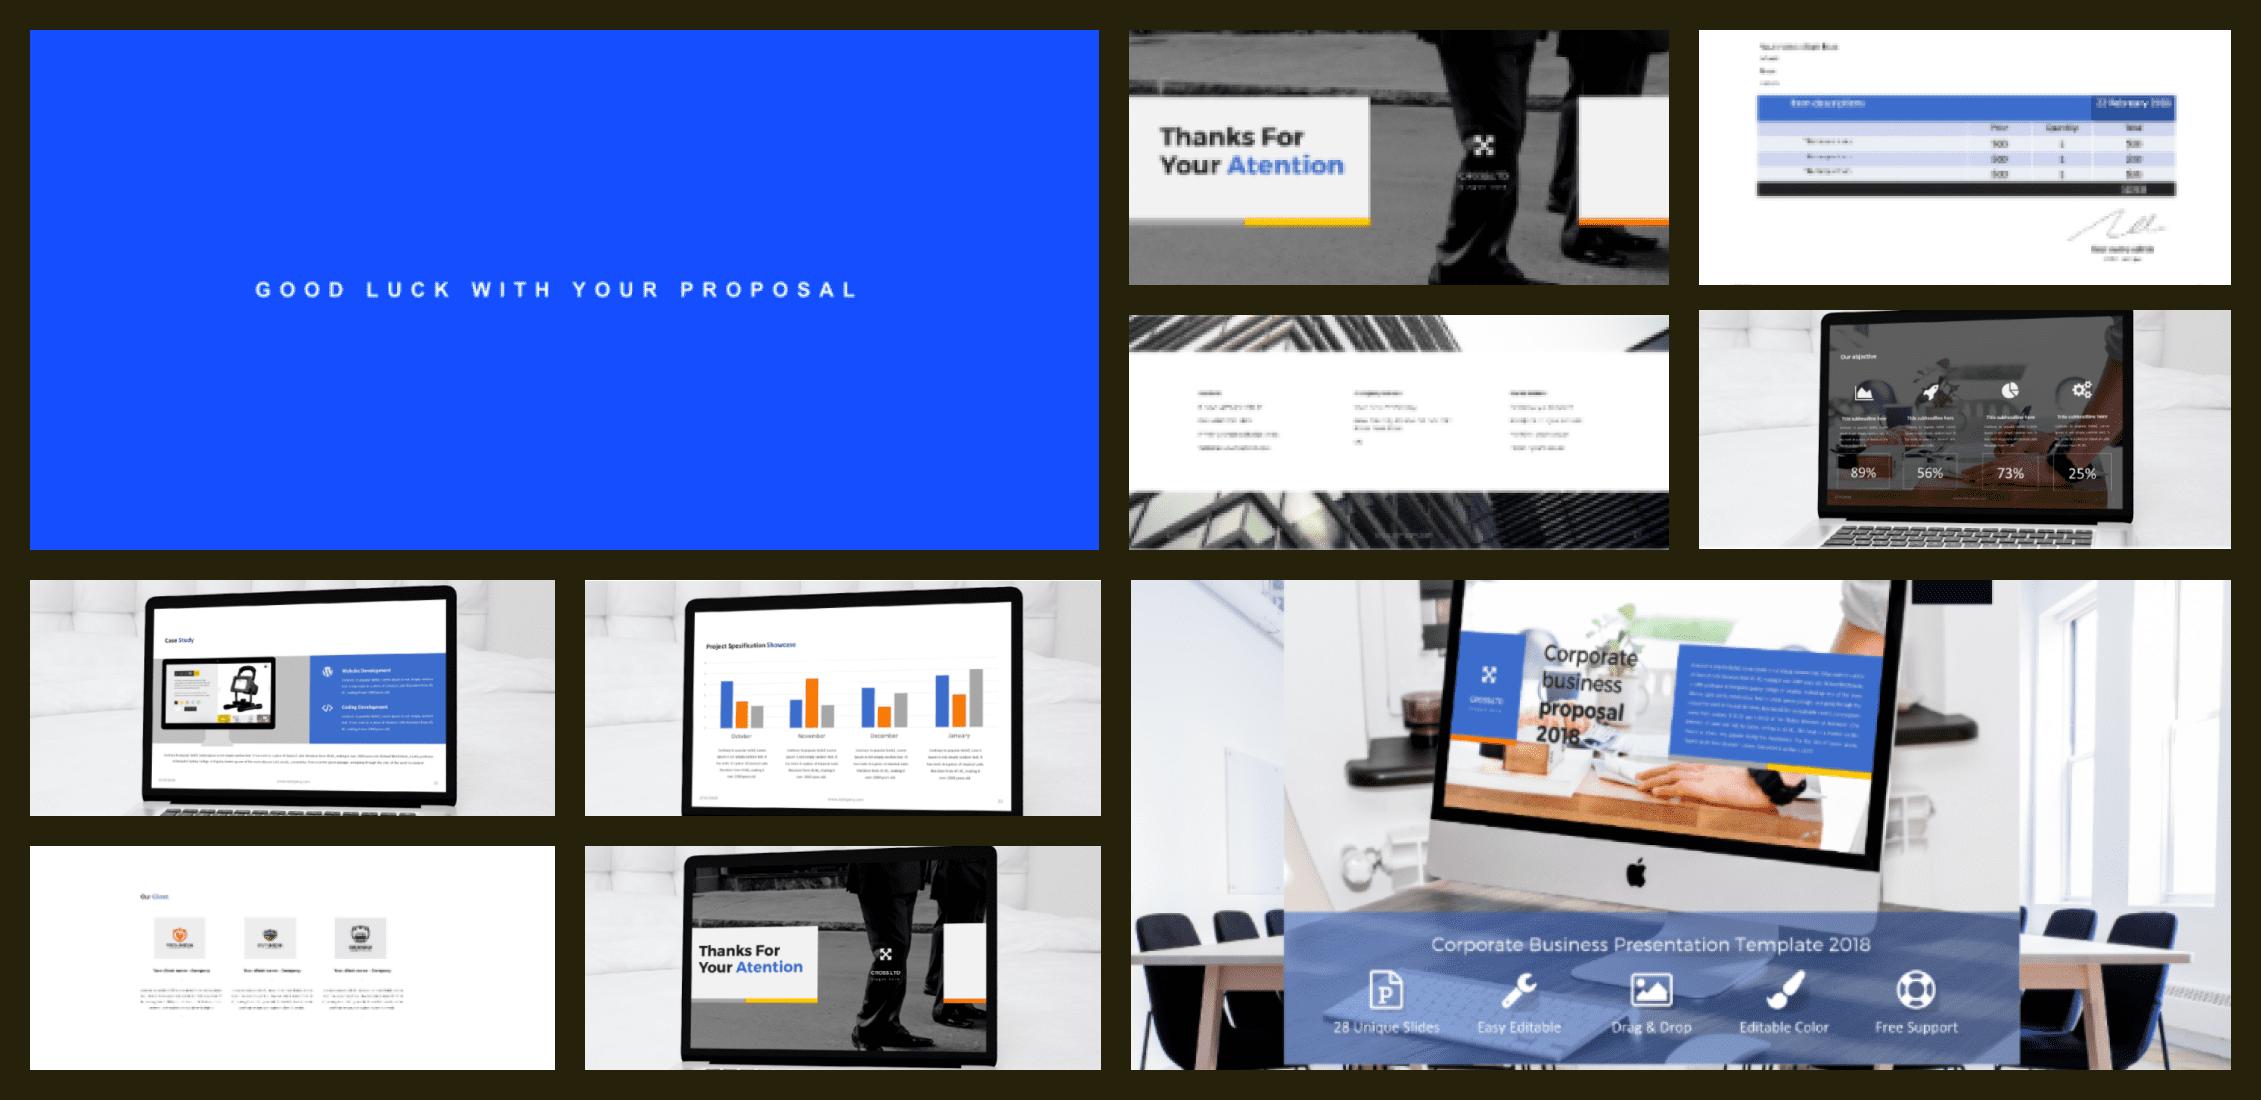 50+ Free and Premium Simple Google Slides Themes in 2021 - simple google slides theme 33